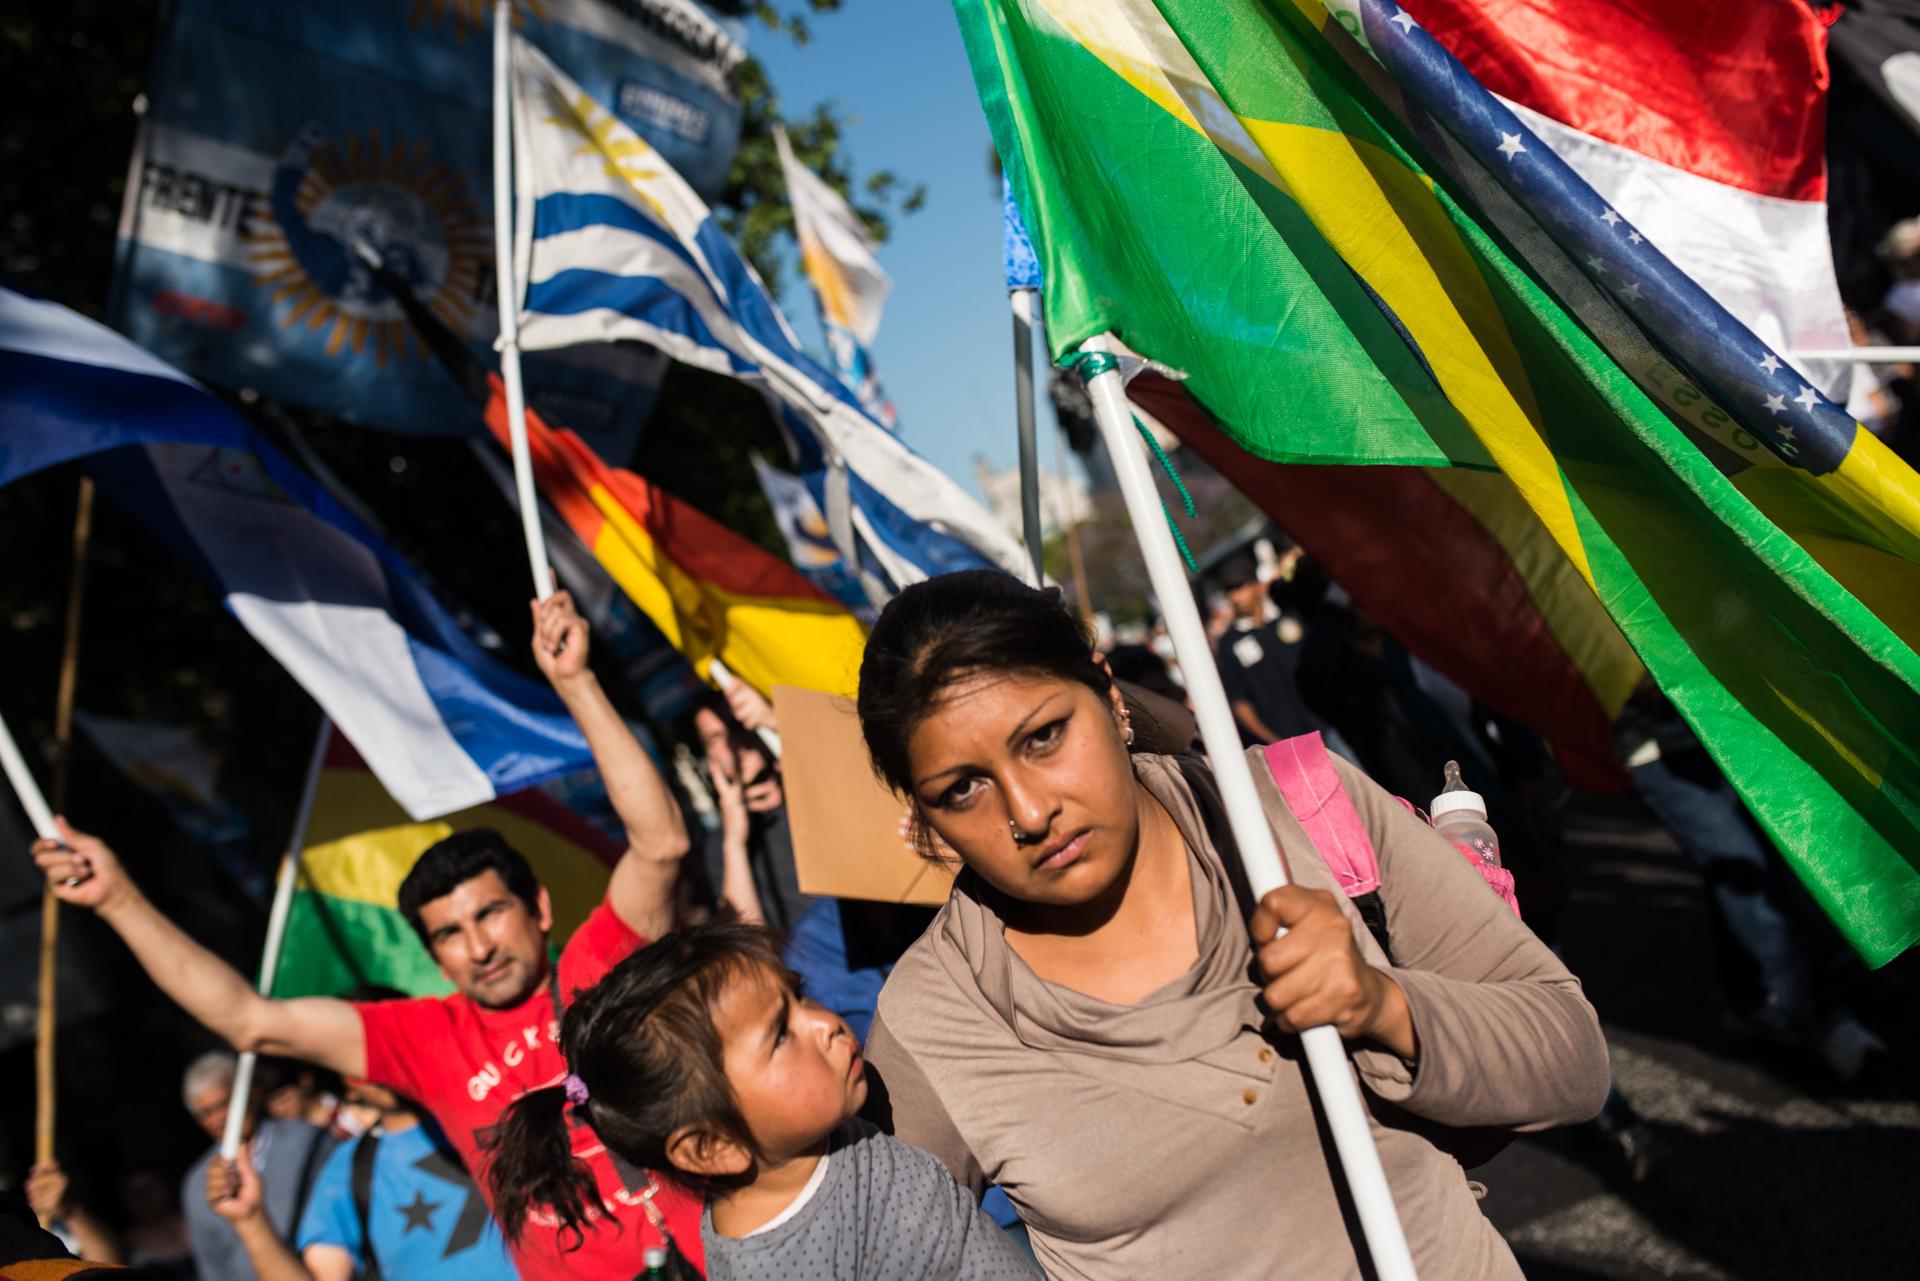 Políticas anti-migratorias de norte a sur: de Donald Trump a Mauricio Macri